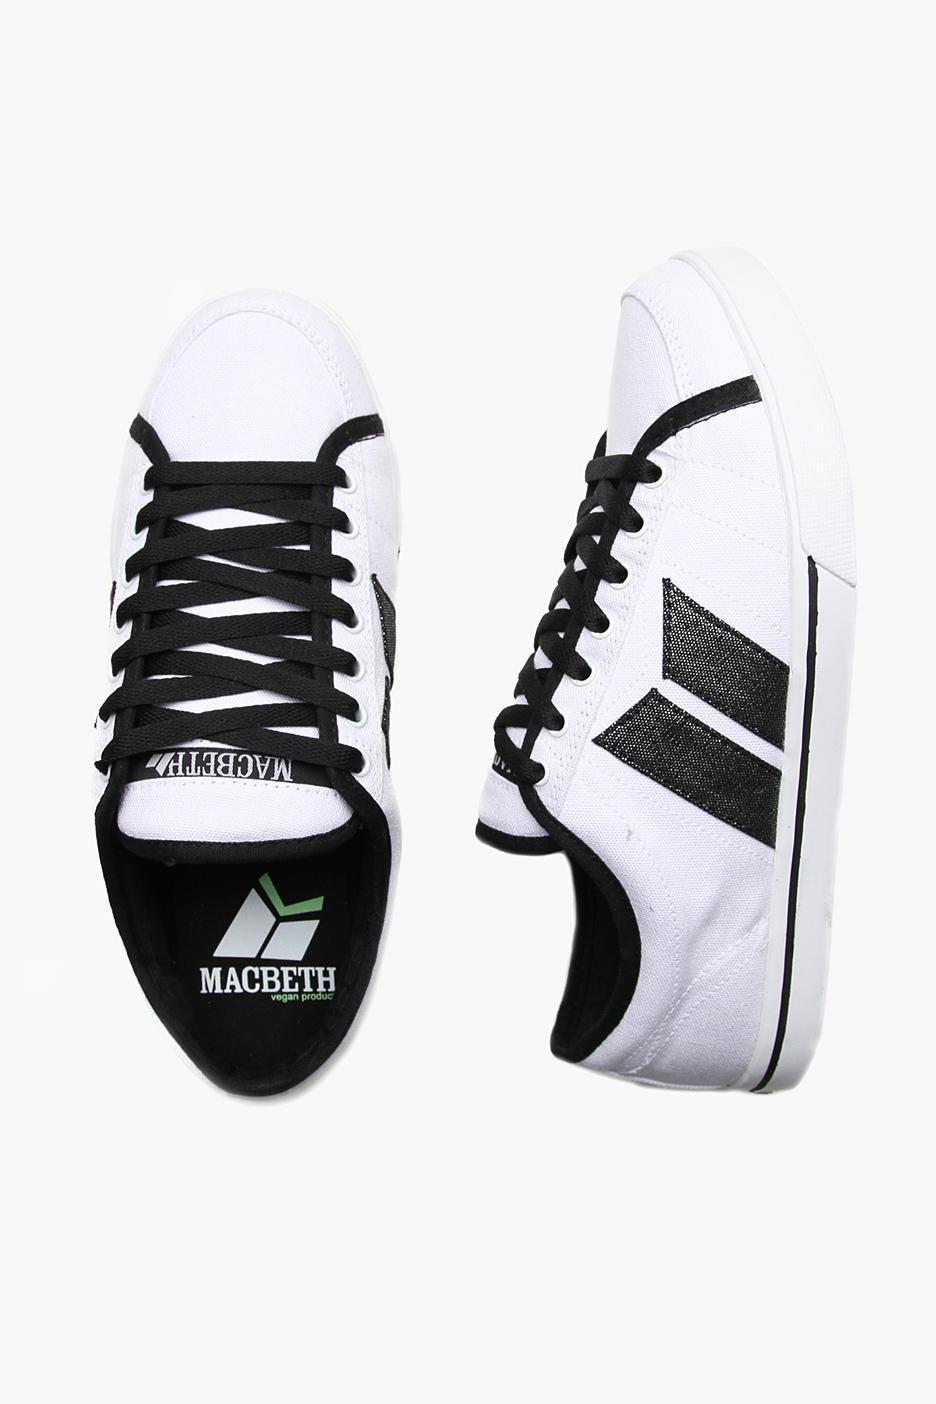 macbeth shoes macbeth shoes. My Favourites Sneakers  Macbeth Shoes